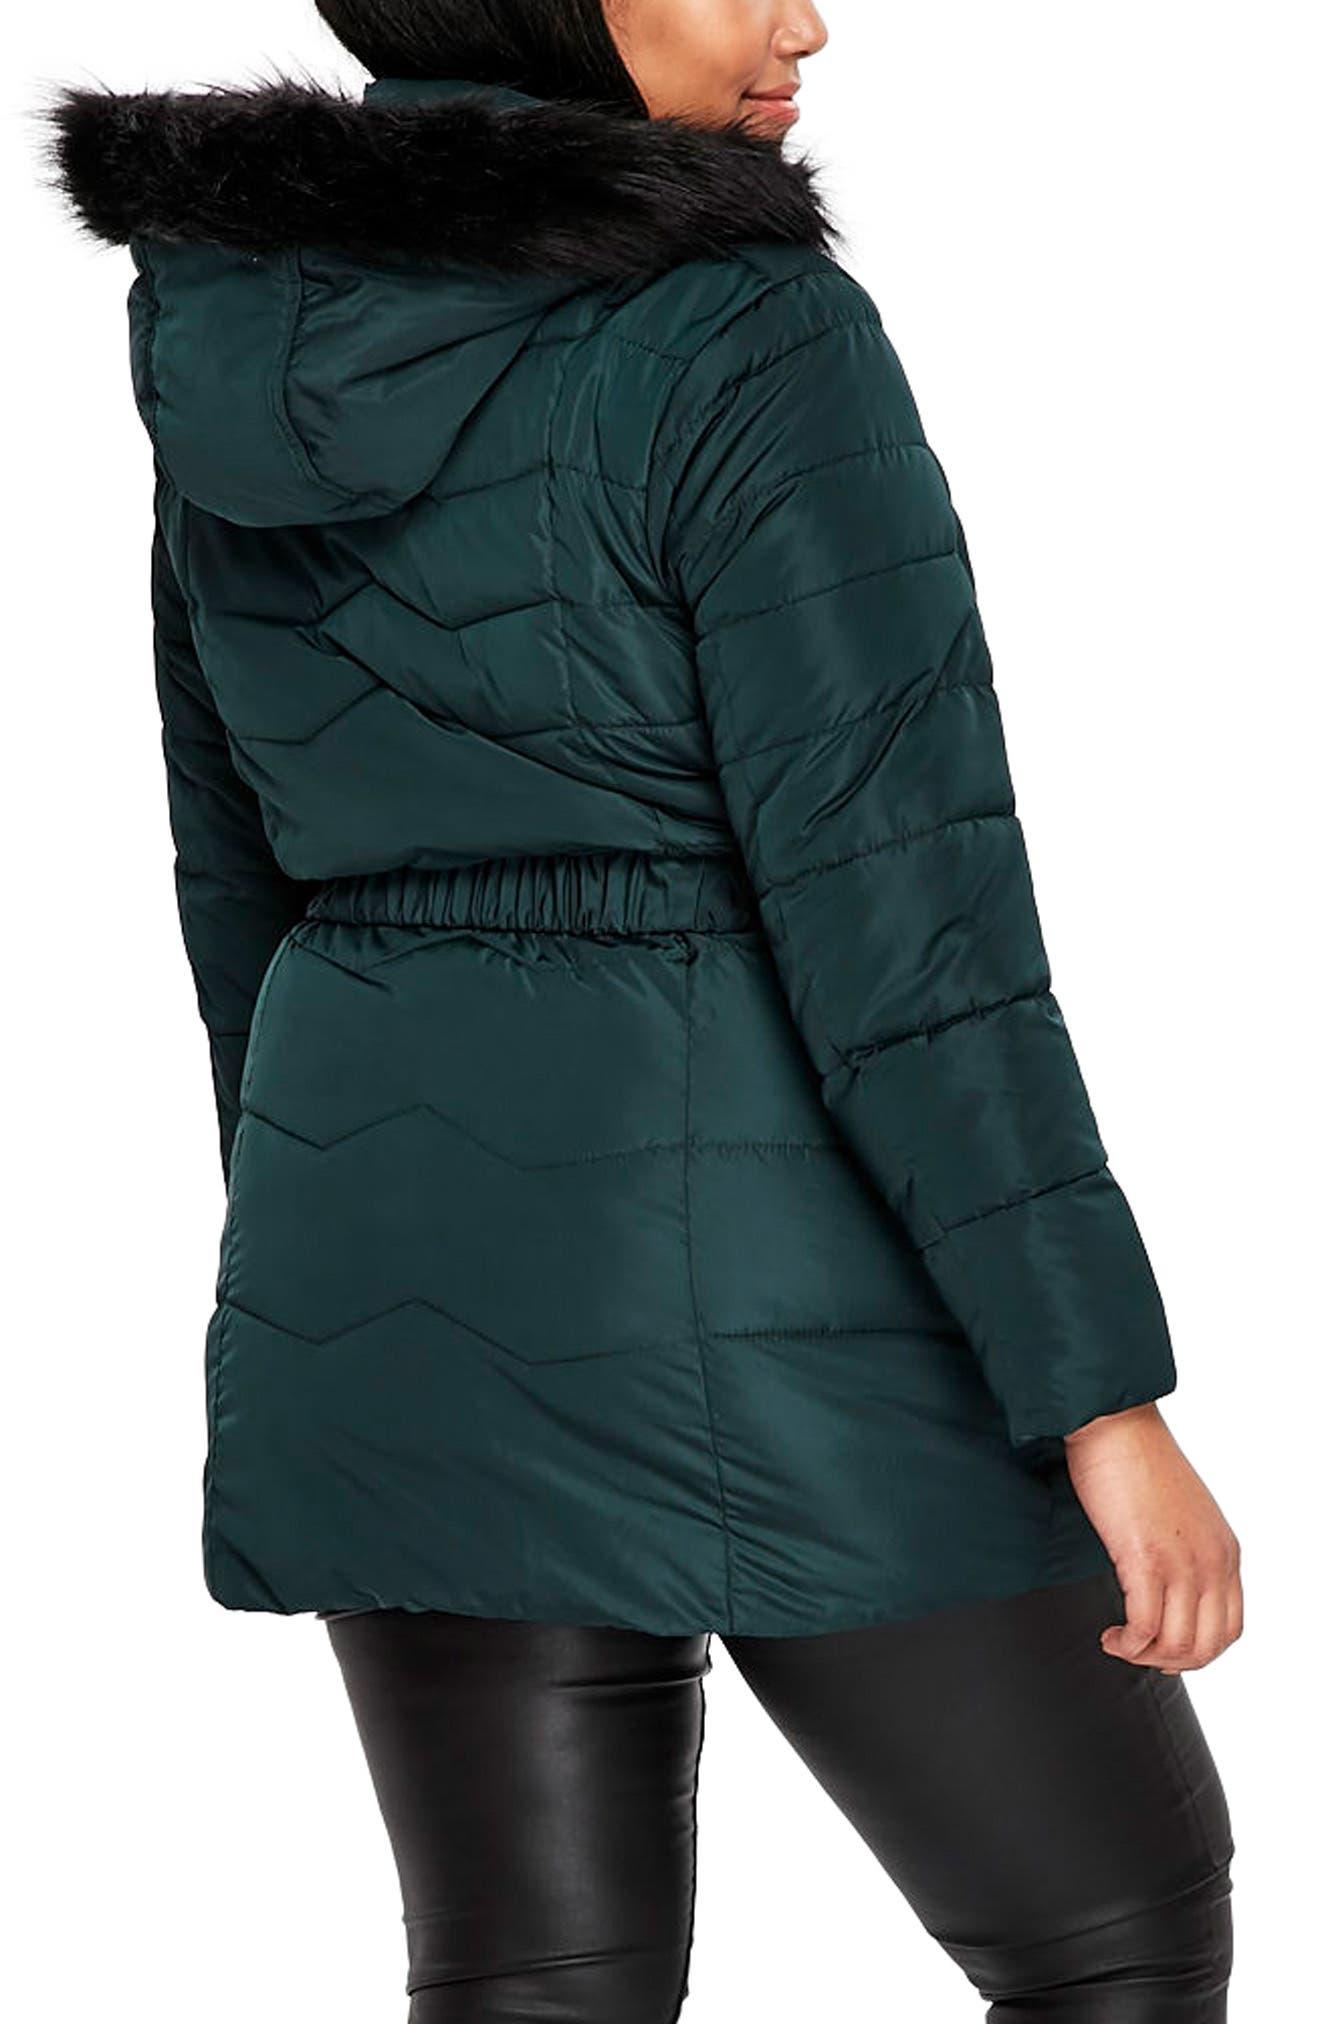 Padded Coat with Faux Fur Trim,                             Alternate thumbnail 3, color,                             Dark Green